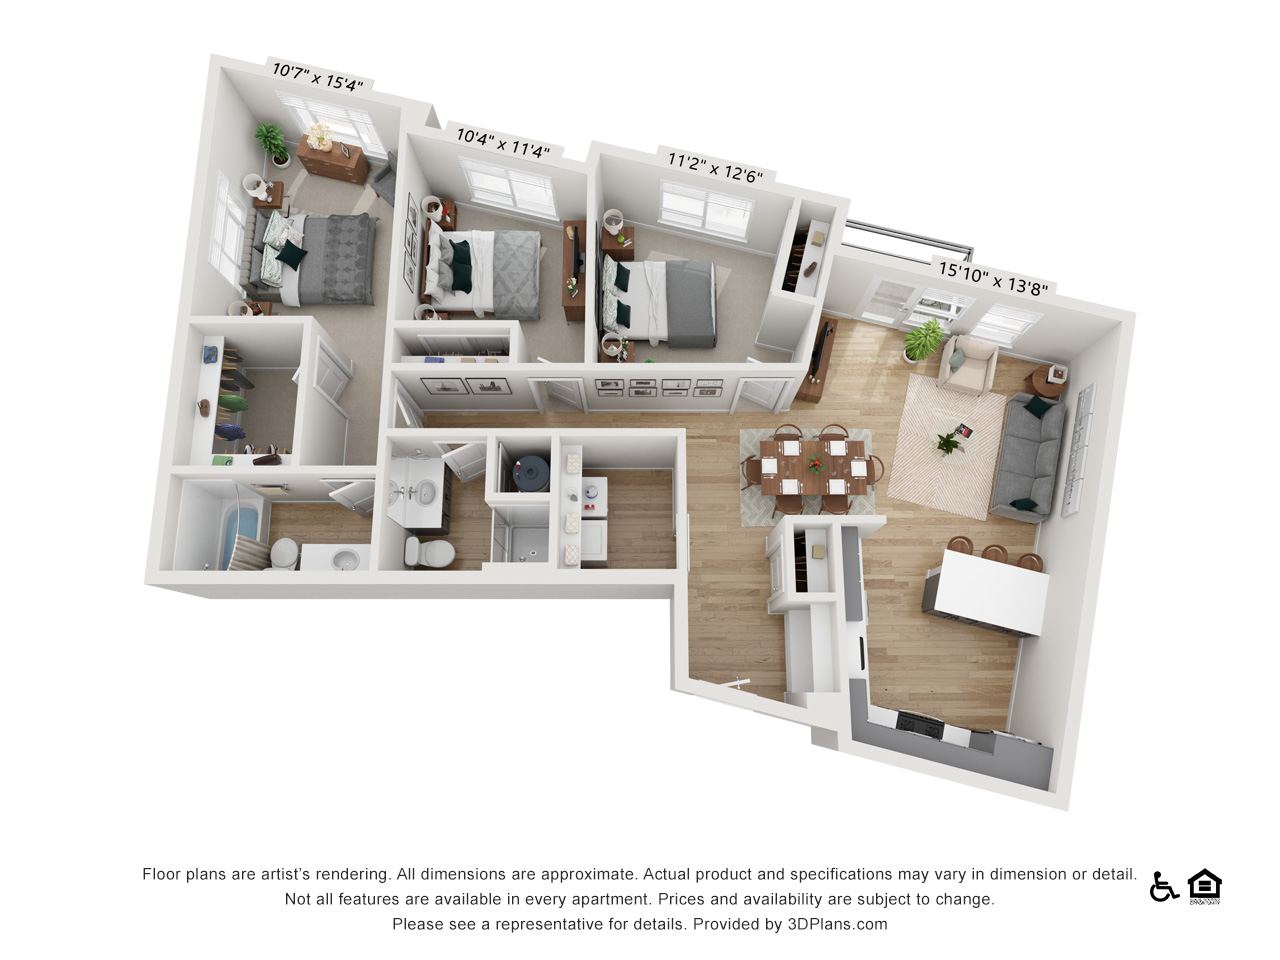 Three Bedroom B | 3 Bedrooms | 2 Bathrooms | 1,356-1,367 sq ft